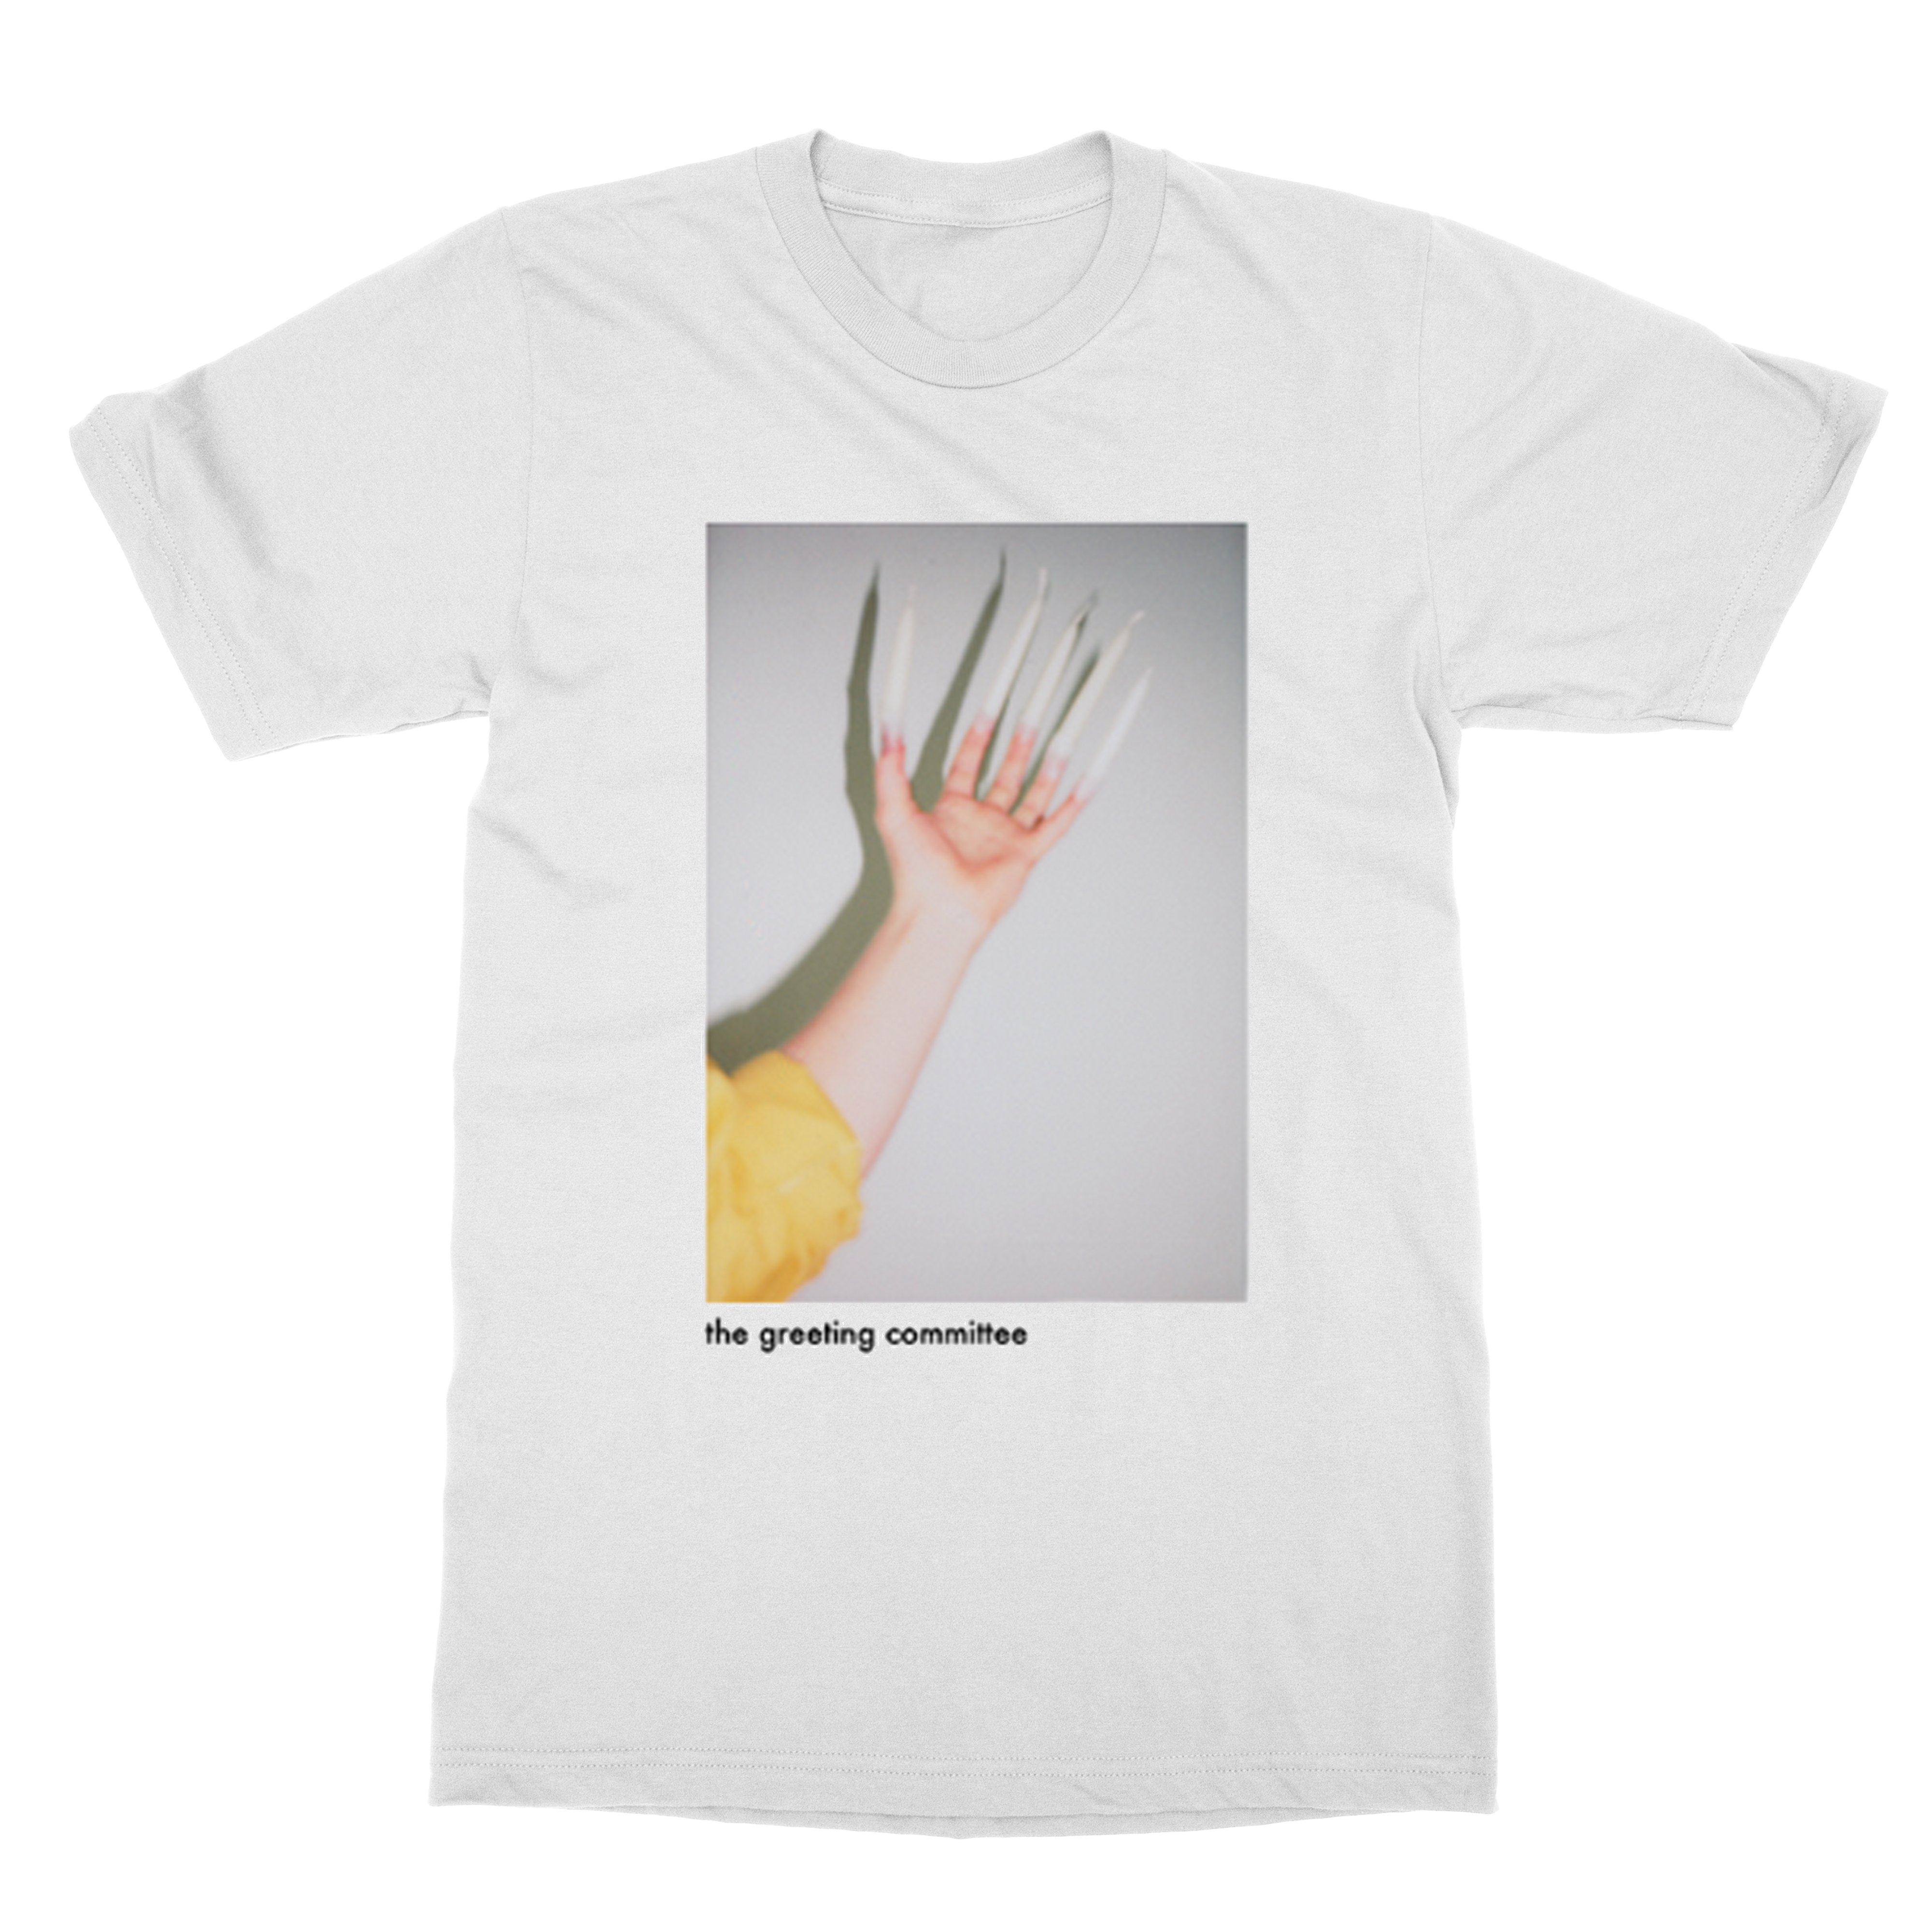 Hand T-shirt - White - The Greeting Committee